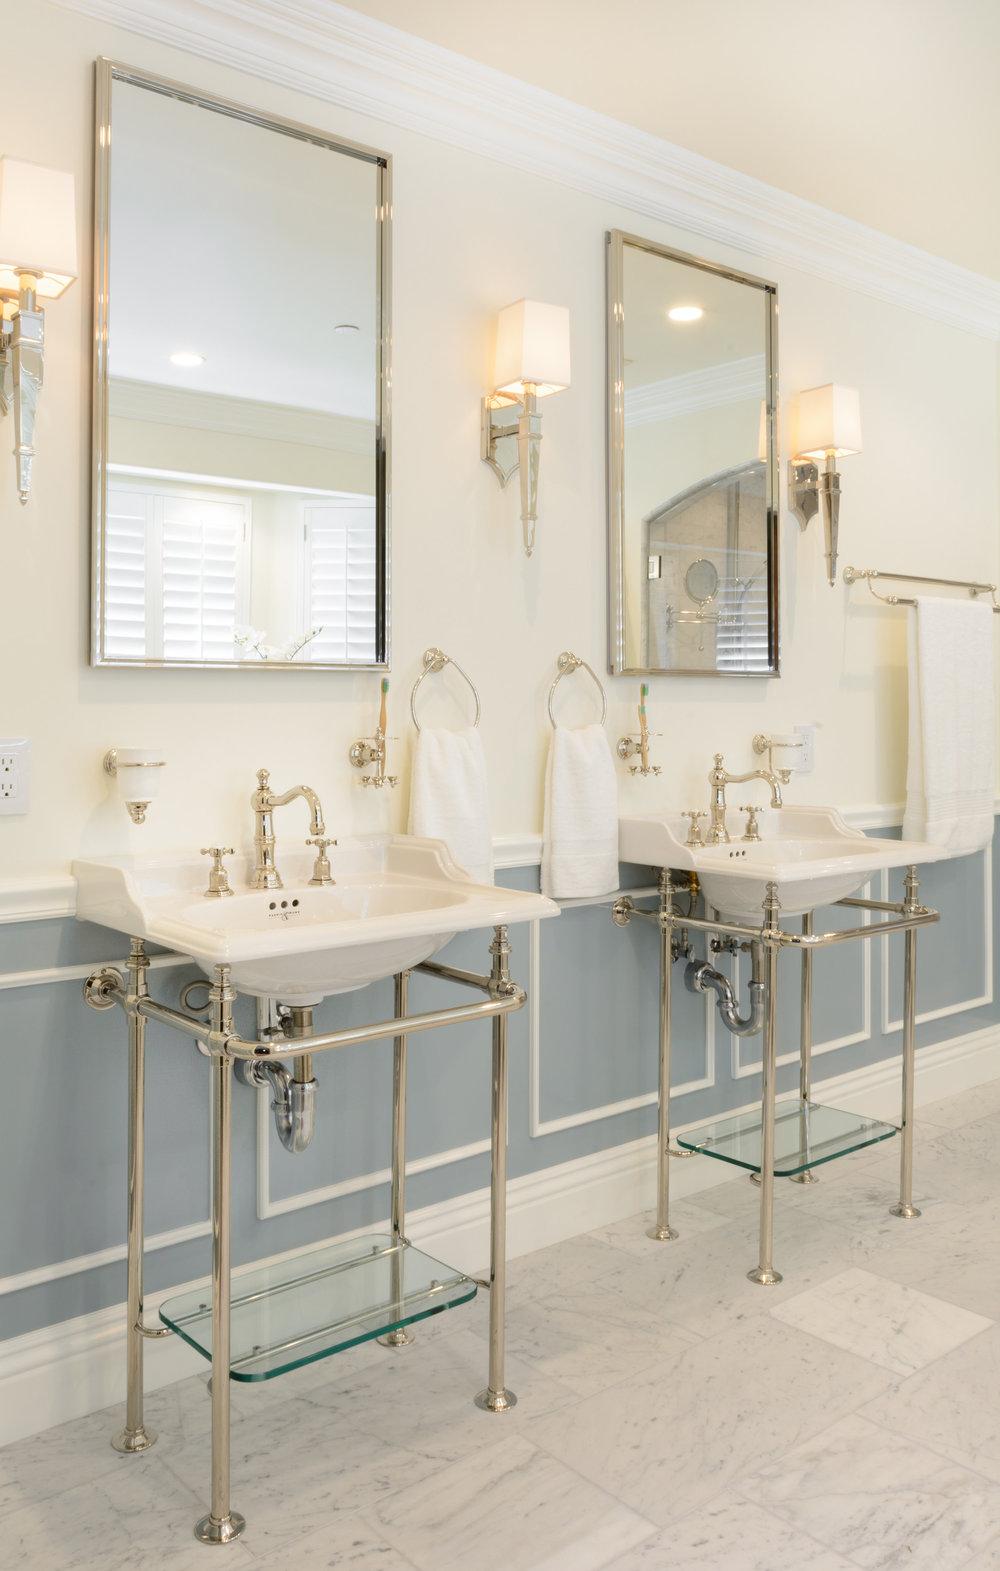 Elegant Victorian design: twin console sinks atop carrera marble floor